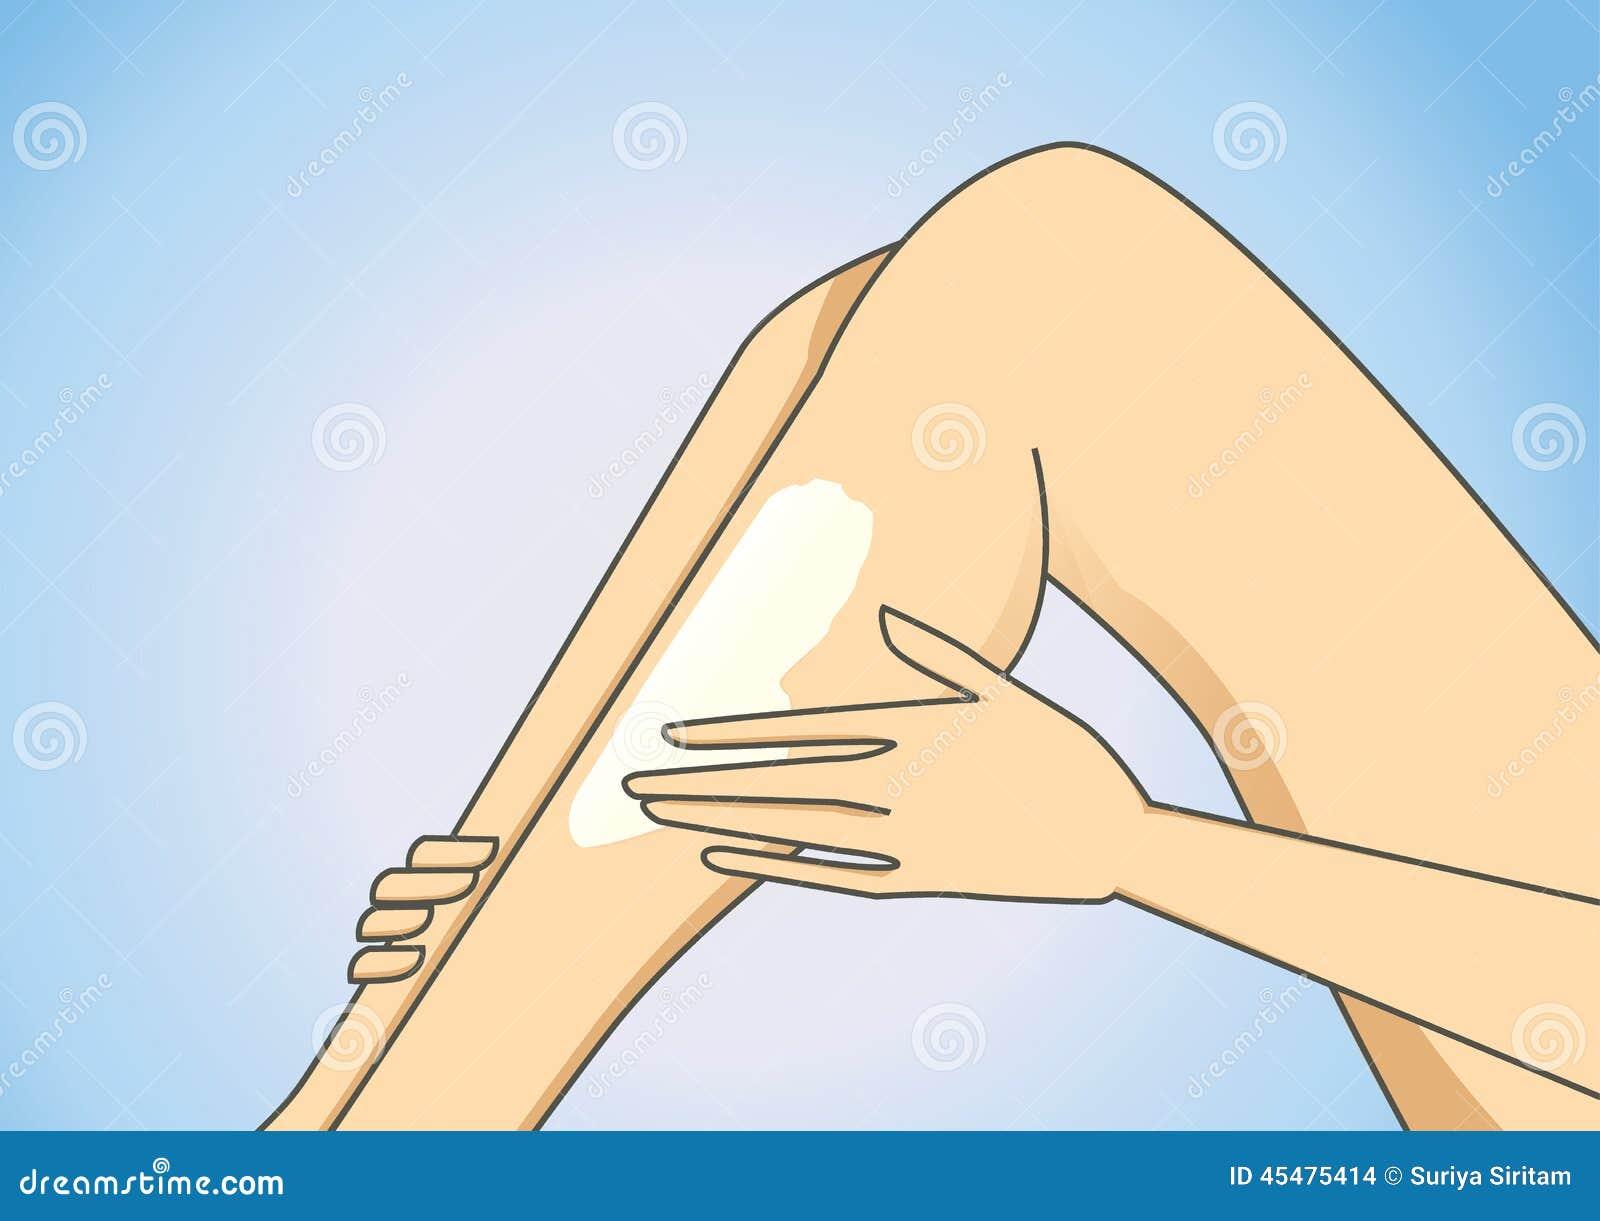 Put on leg lotion